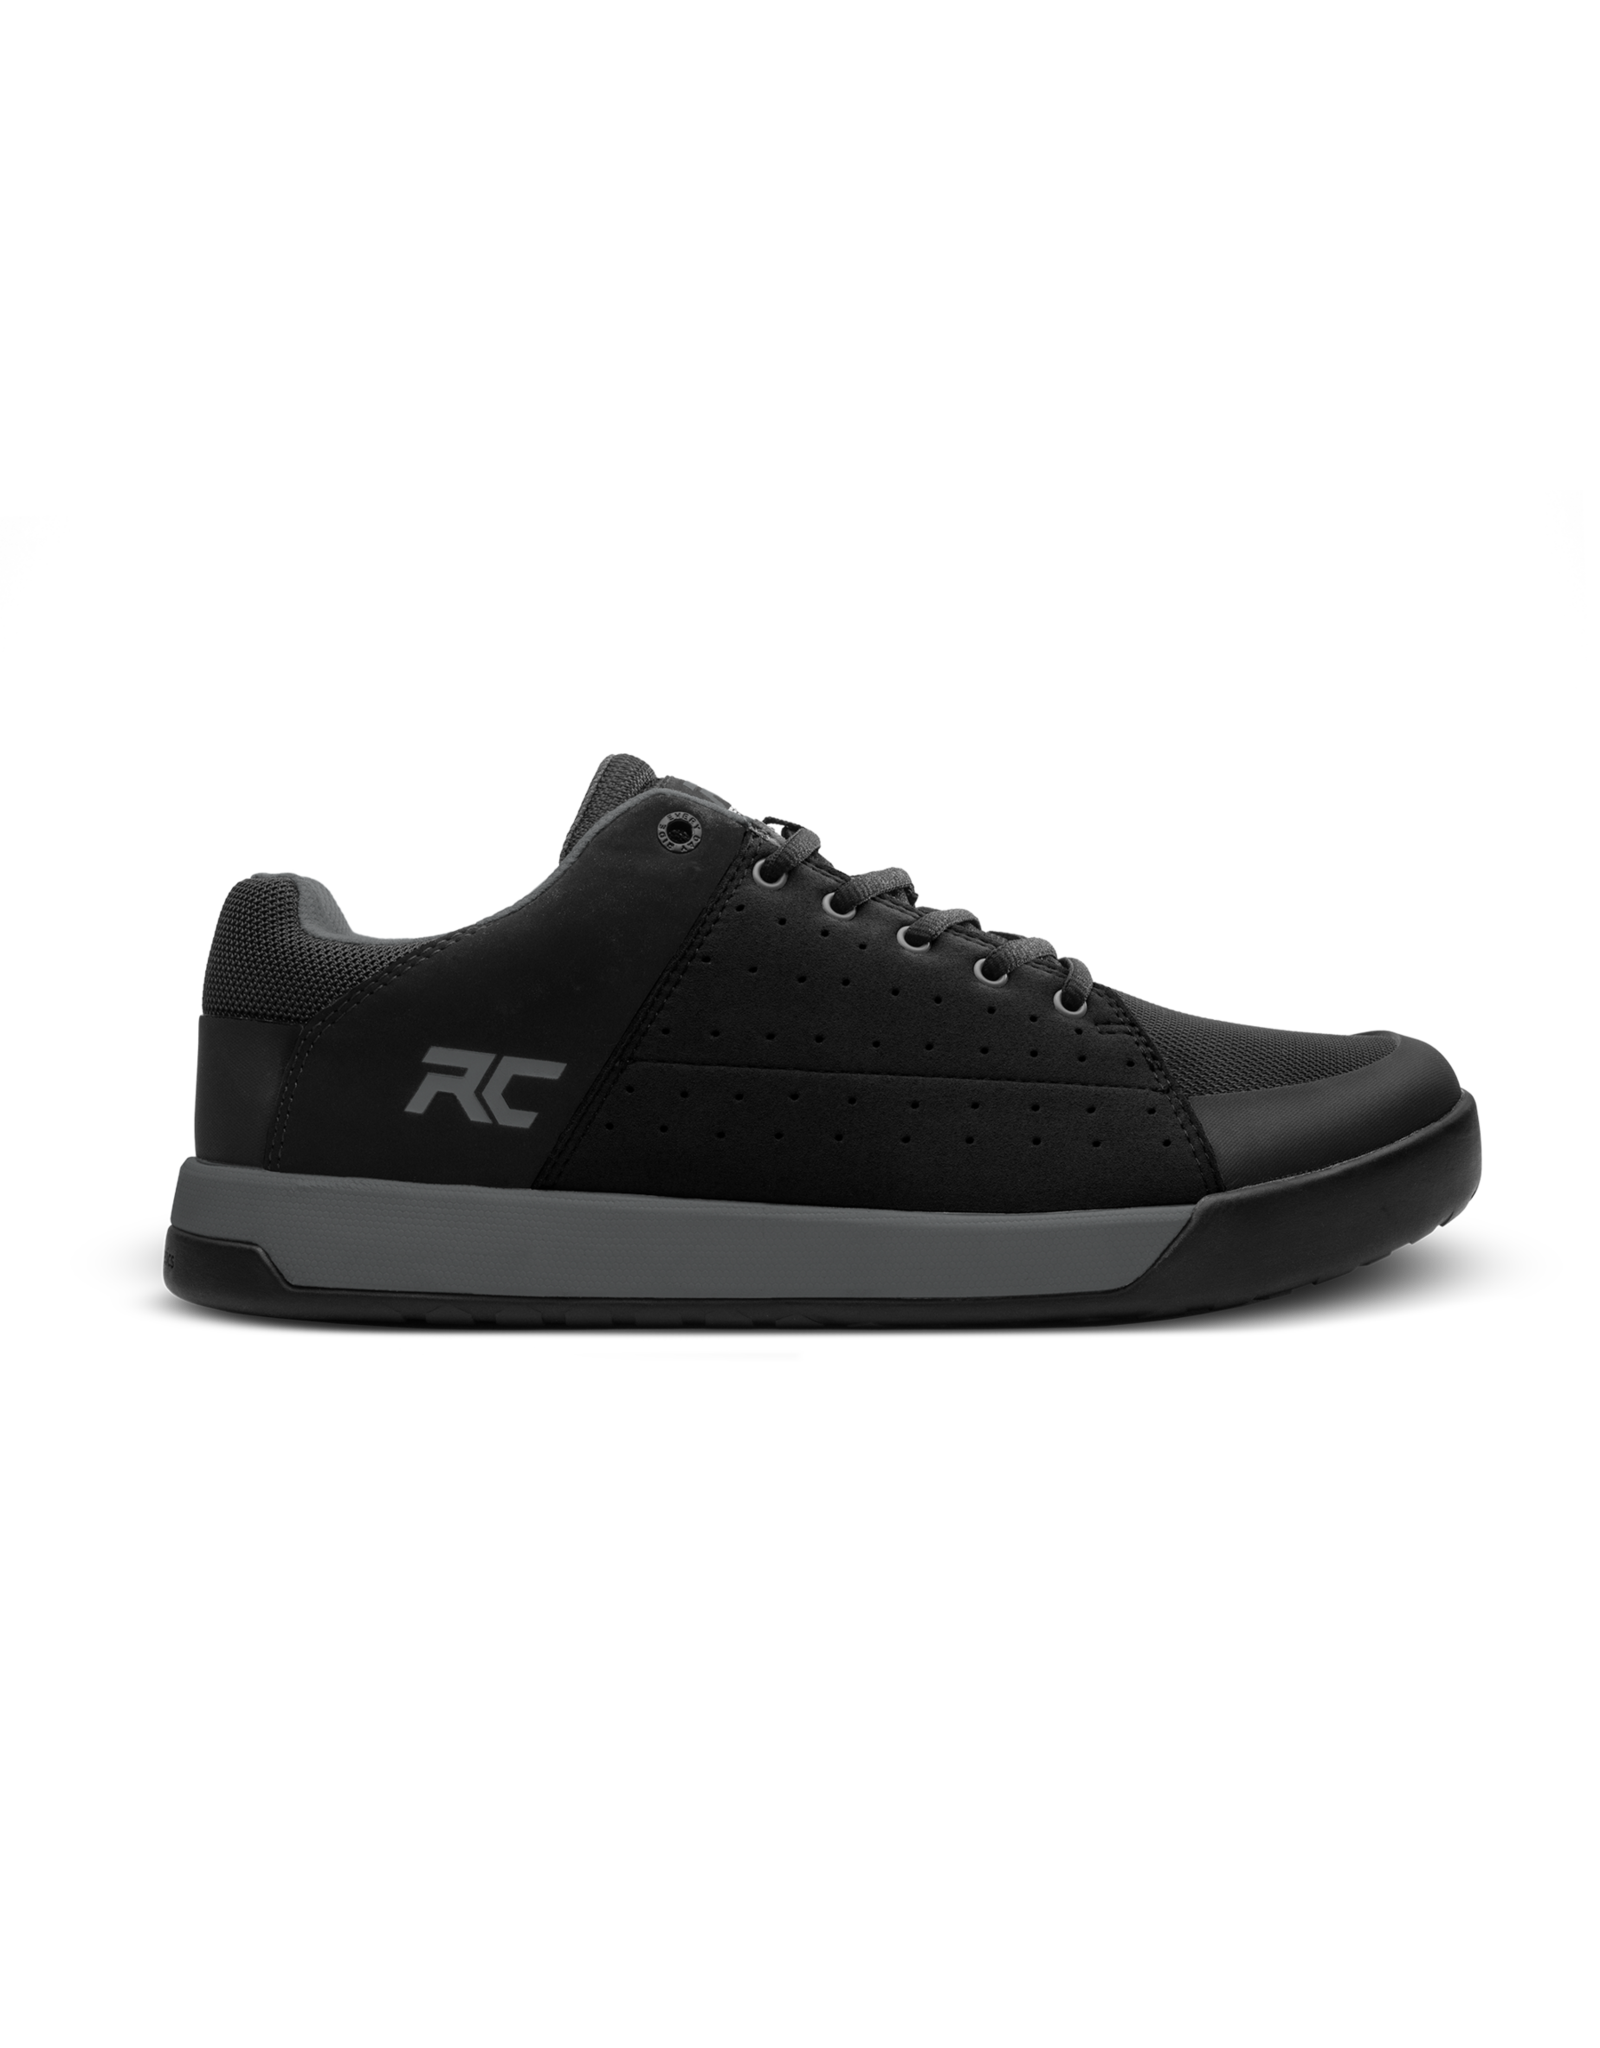 Ride Concept Ride Concept Livewire 42.5 / 9.5 - Char/black